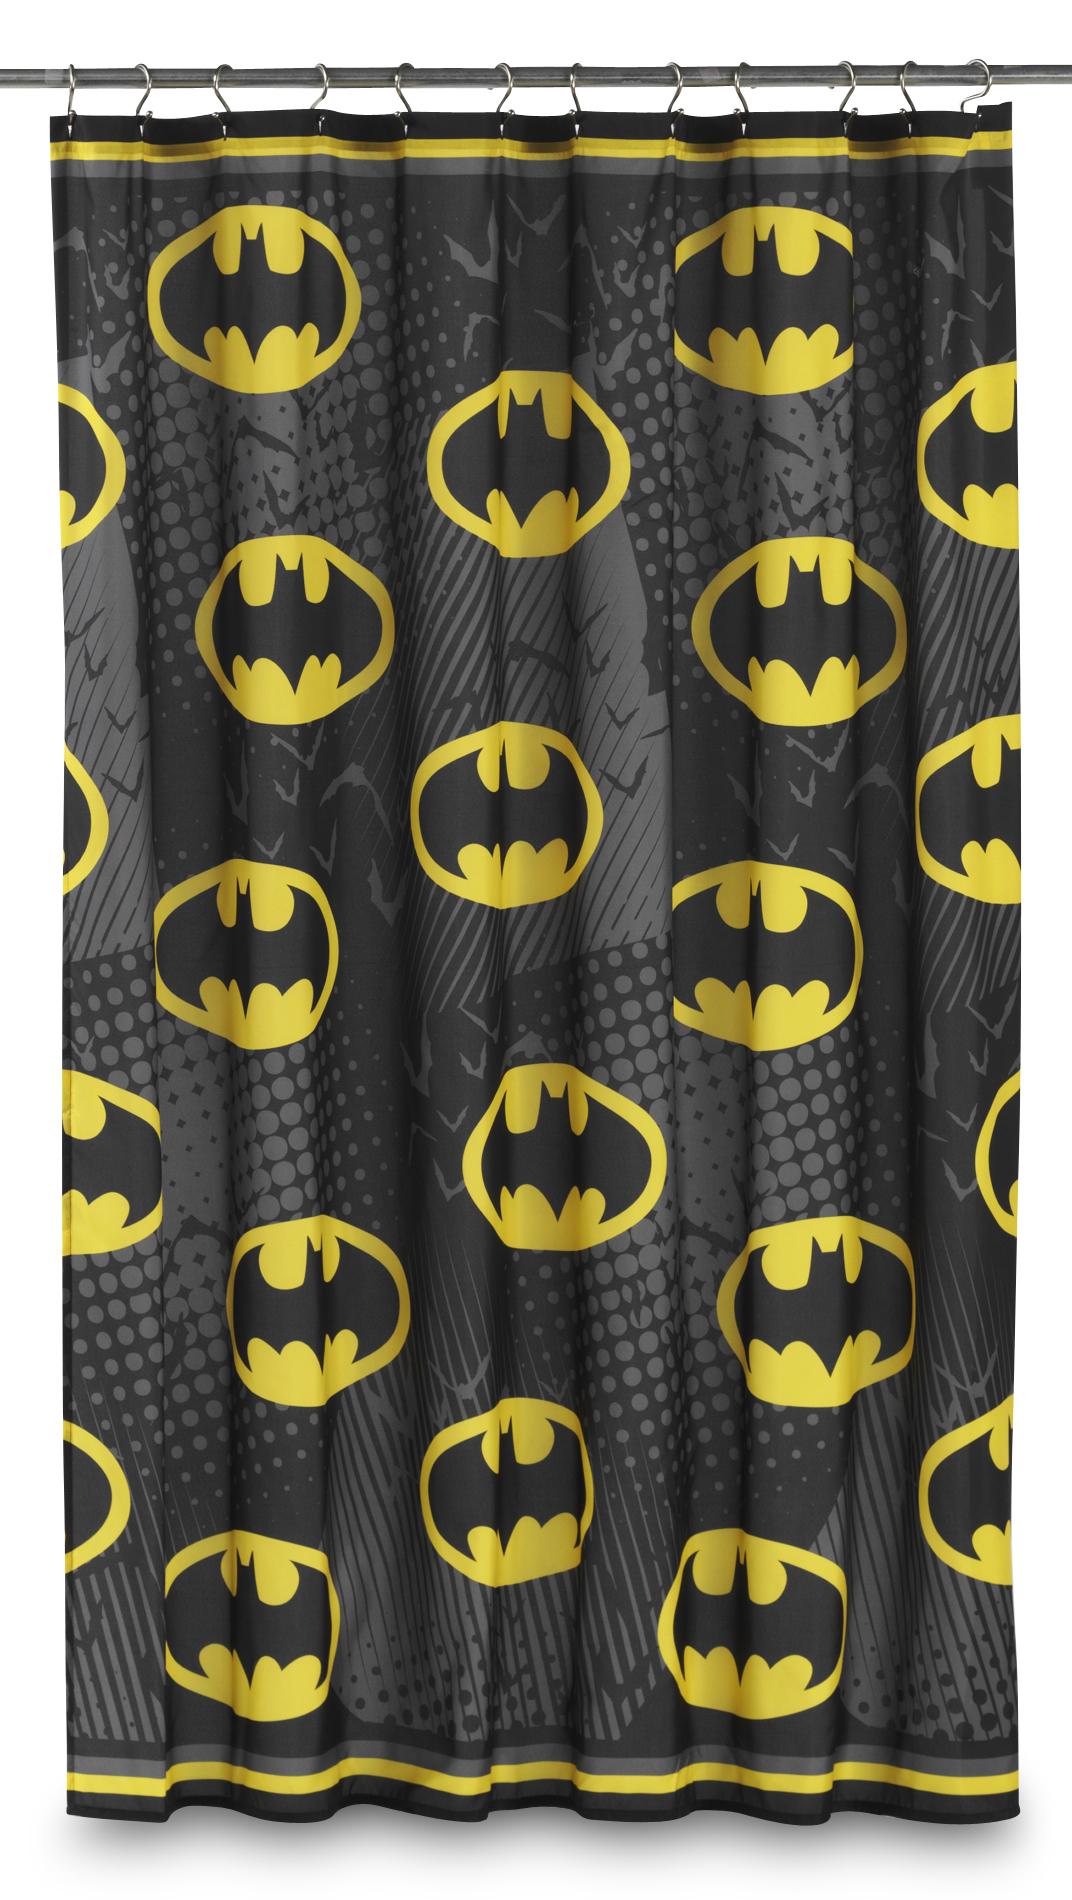 DC Comics Batman Fabric Shower Curtain  Bat Symbol  Home